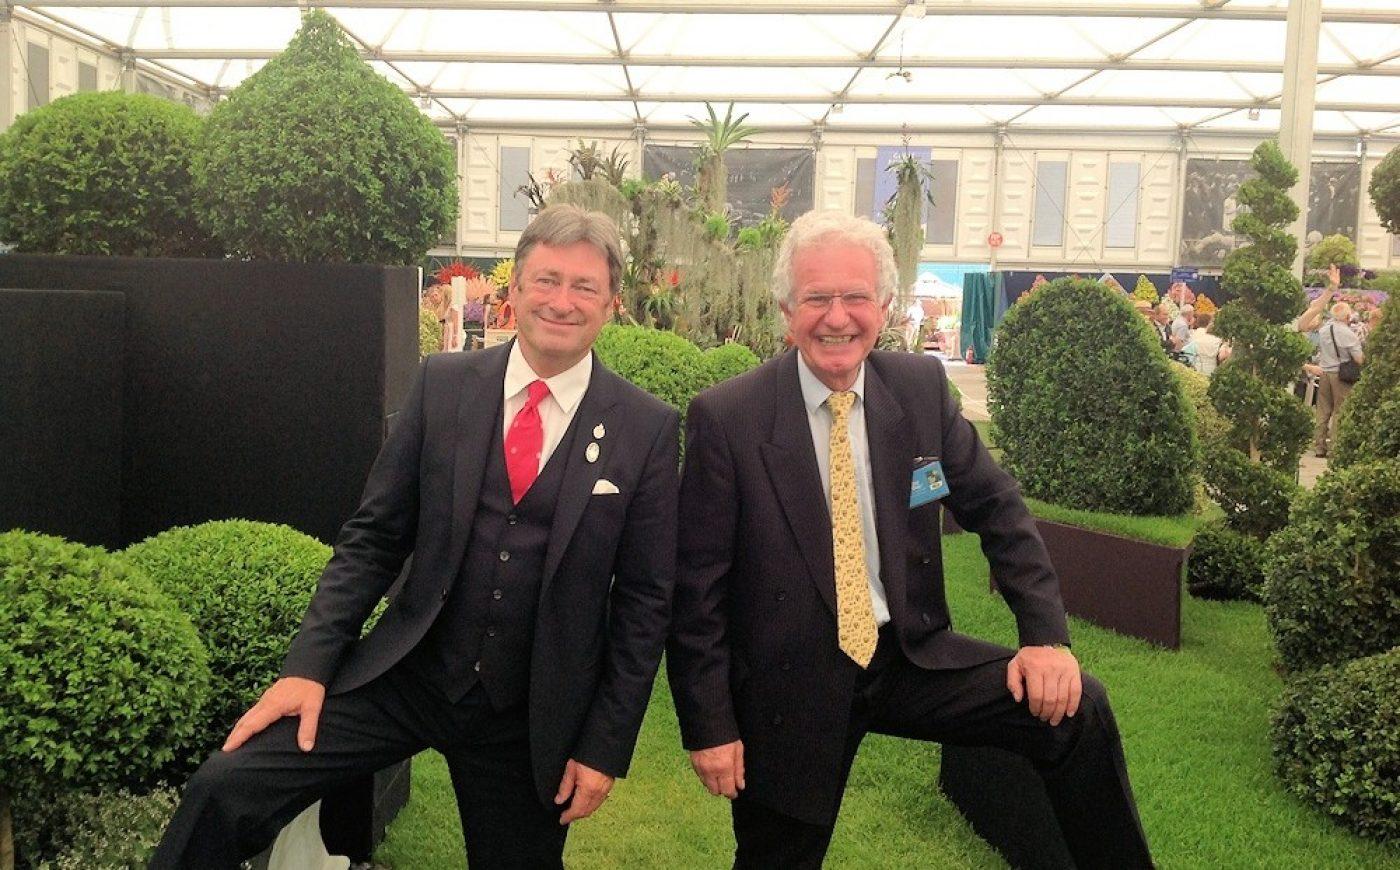 Alan Titchmarsh & James Crebbin -Bailey at Chelsea